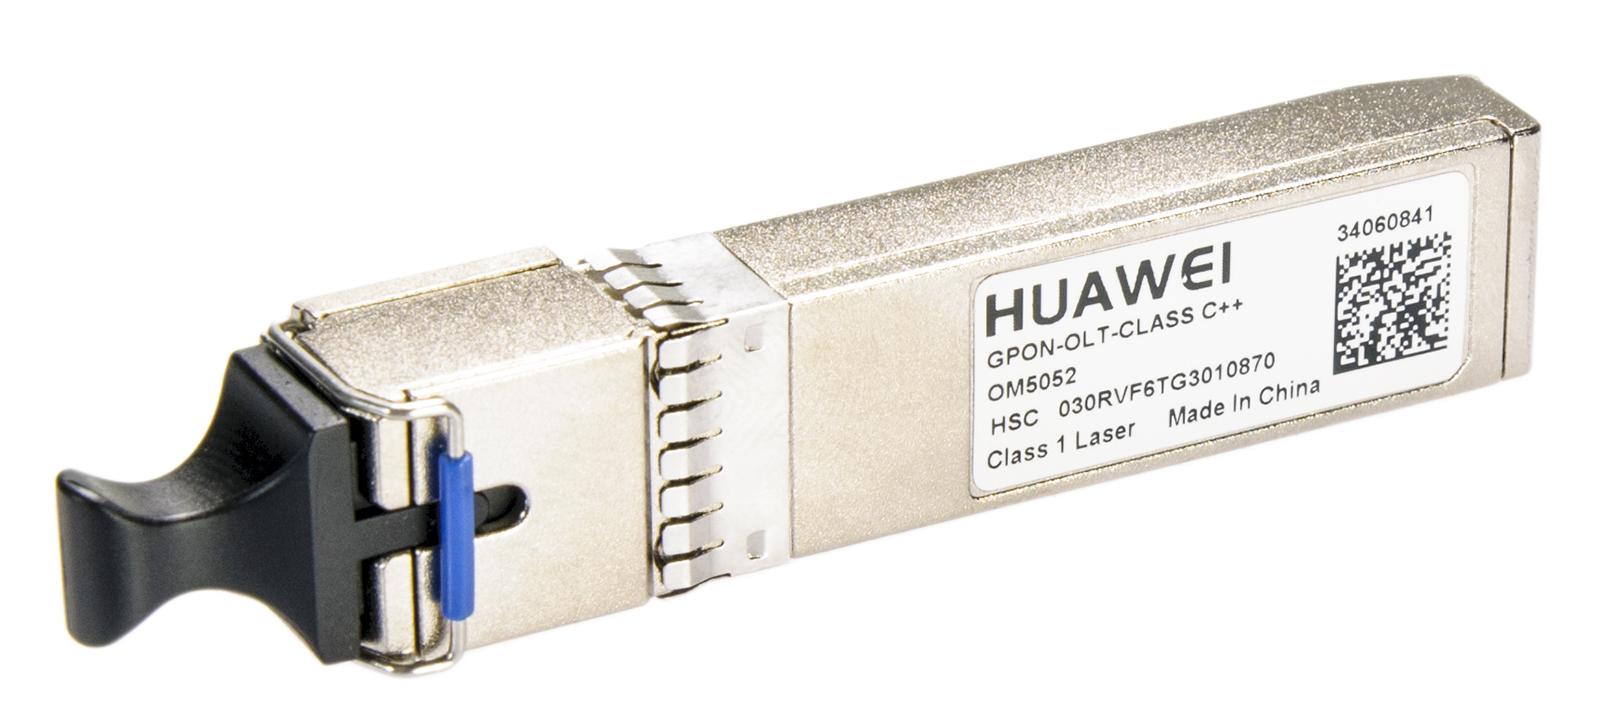 Huawei GPON OLT wkładka SFP C++